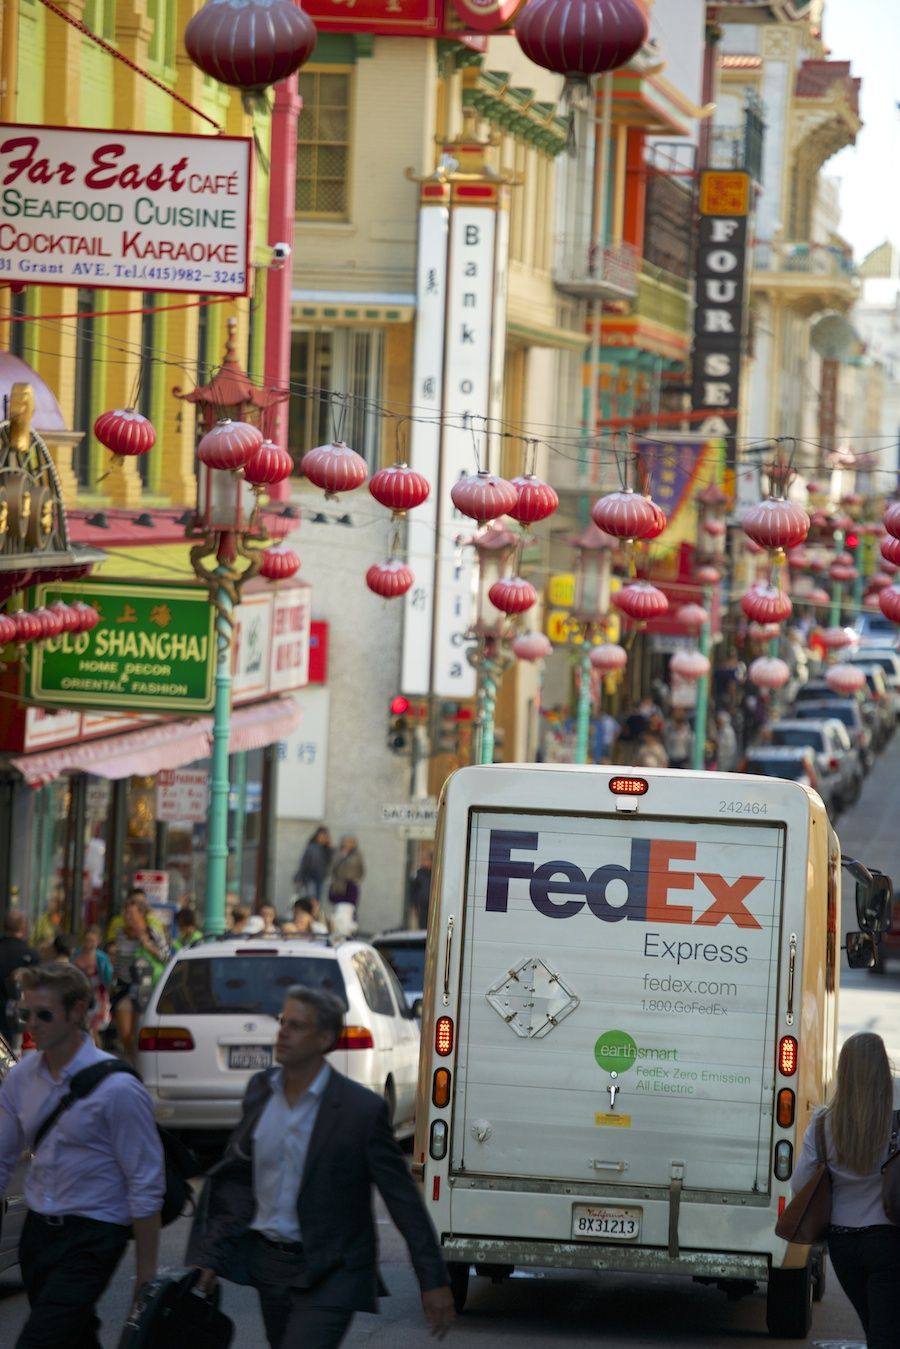 Colorful Chinatown in San Francisco, CA. Logistics